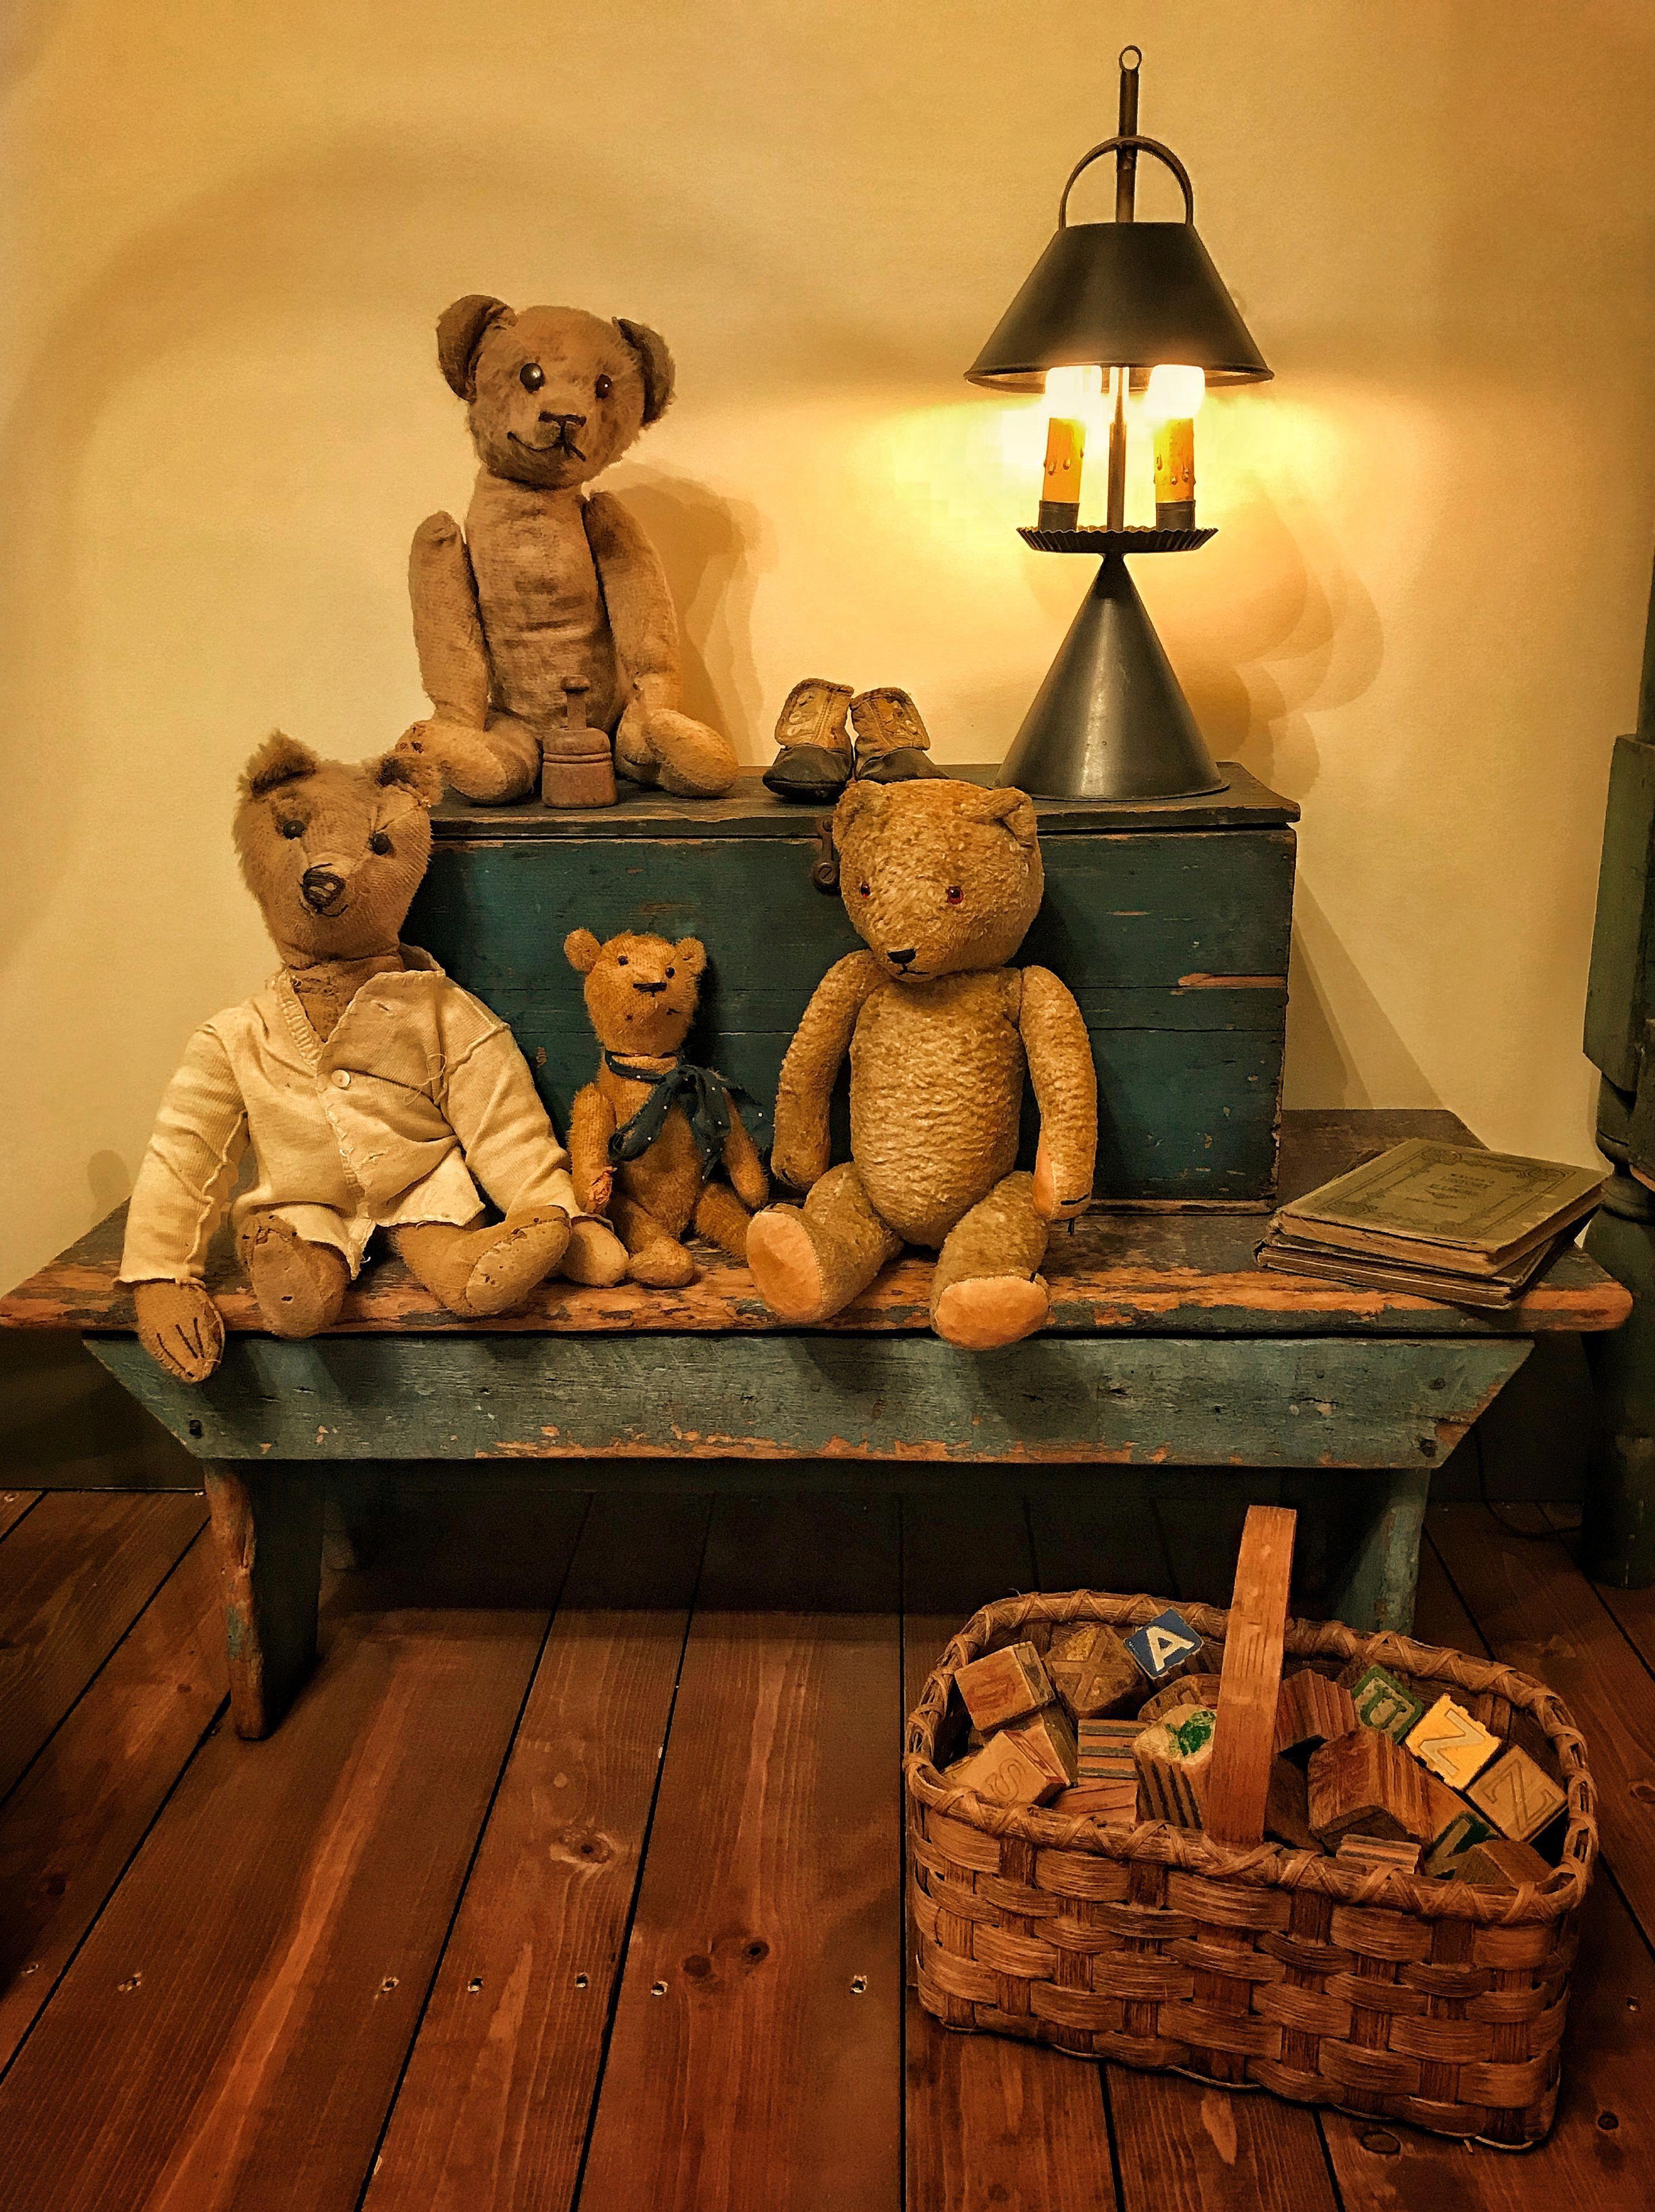 Country Primitive Bathroom Decorating Ideas Primitivecountrydecorating Antique Teddy Bears Vintage Teddy Bears Old Teddy Bears Country bear bathroom decor